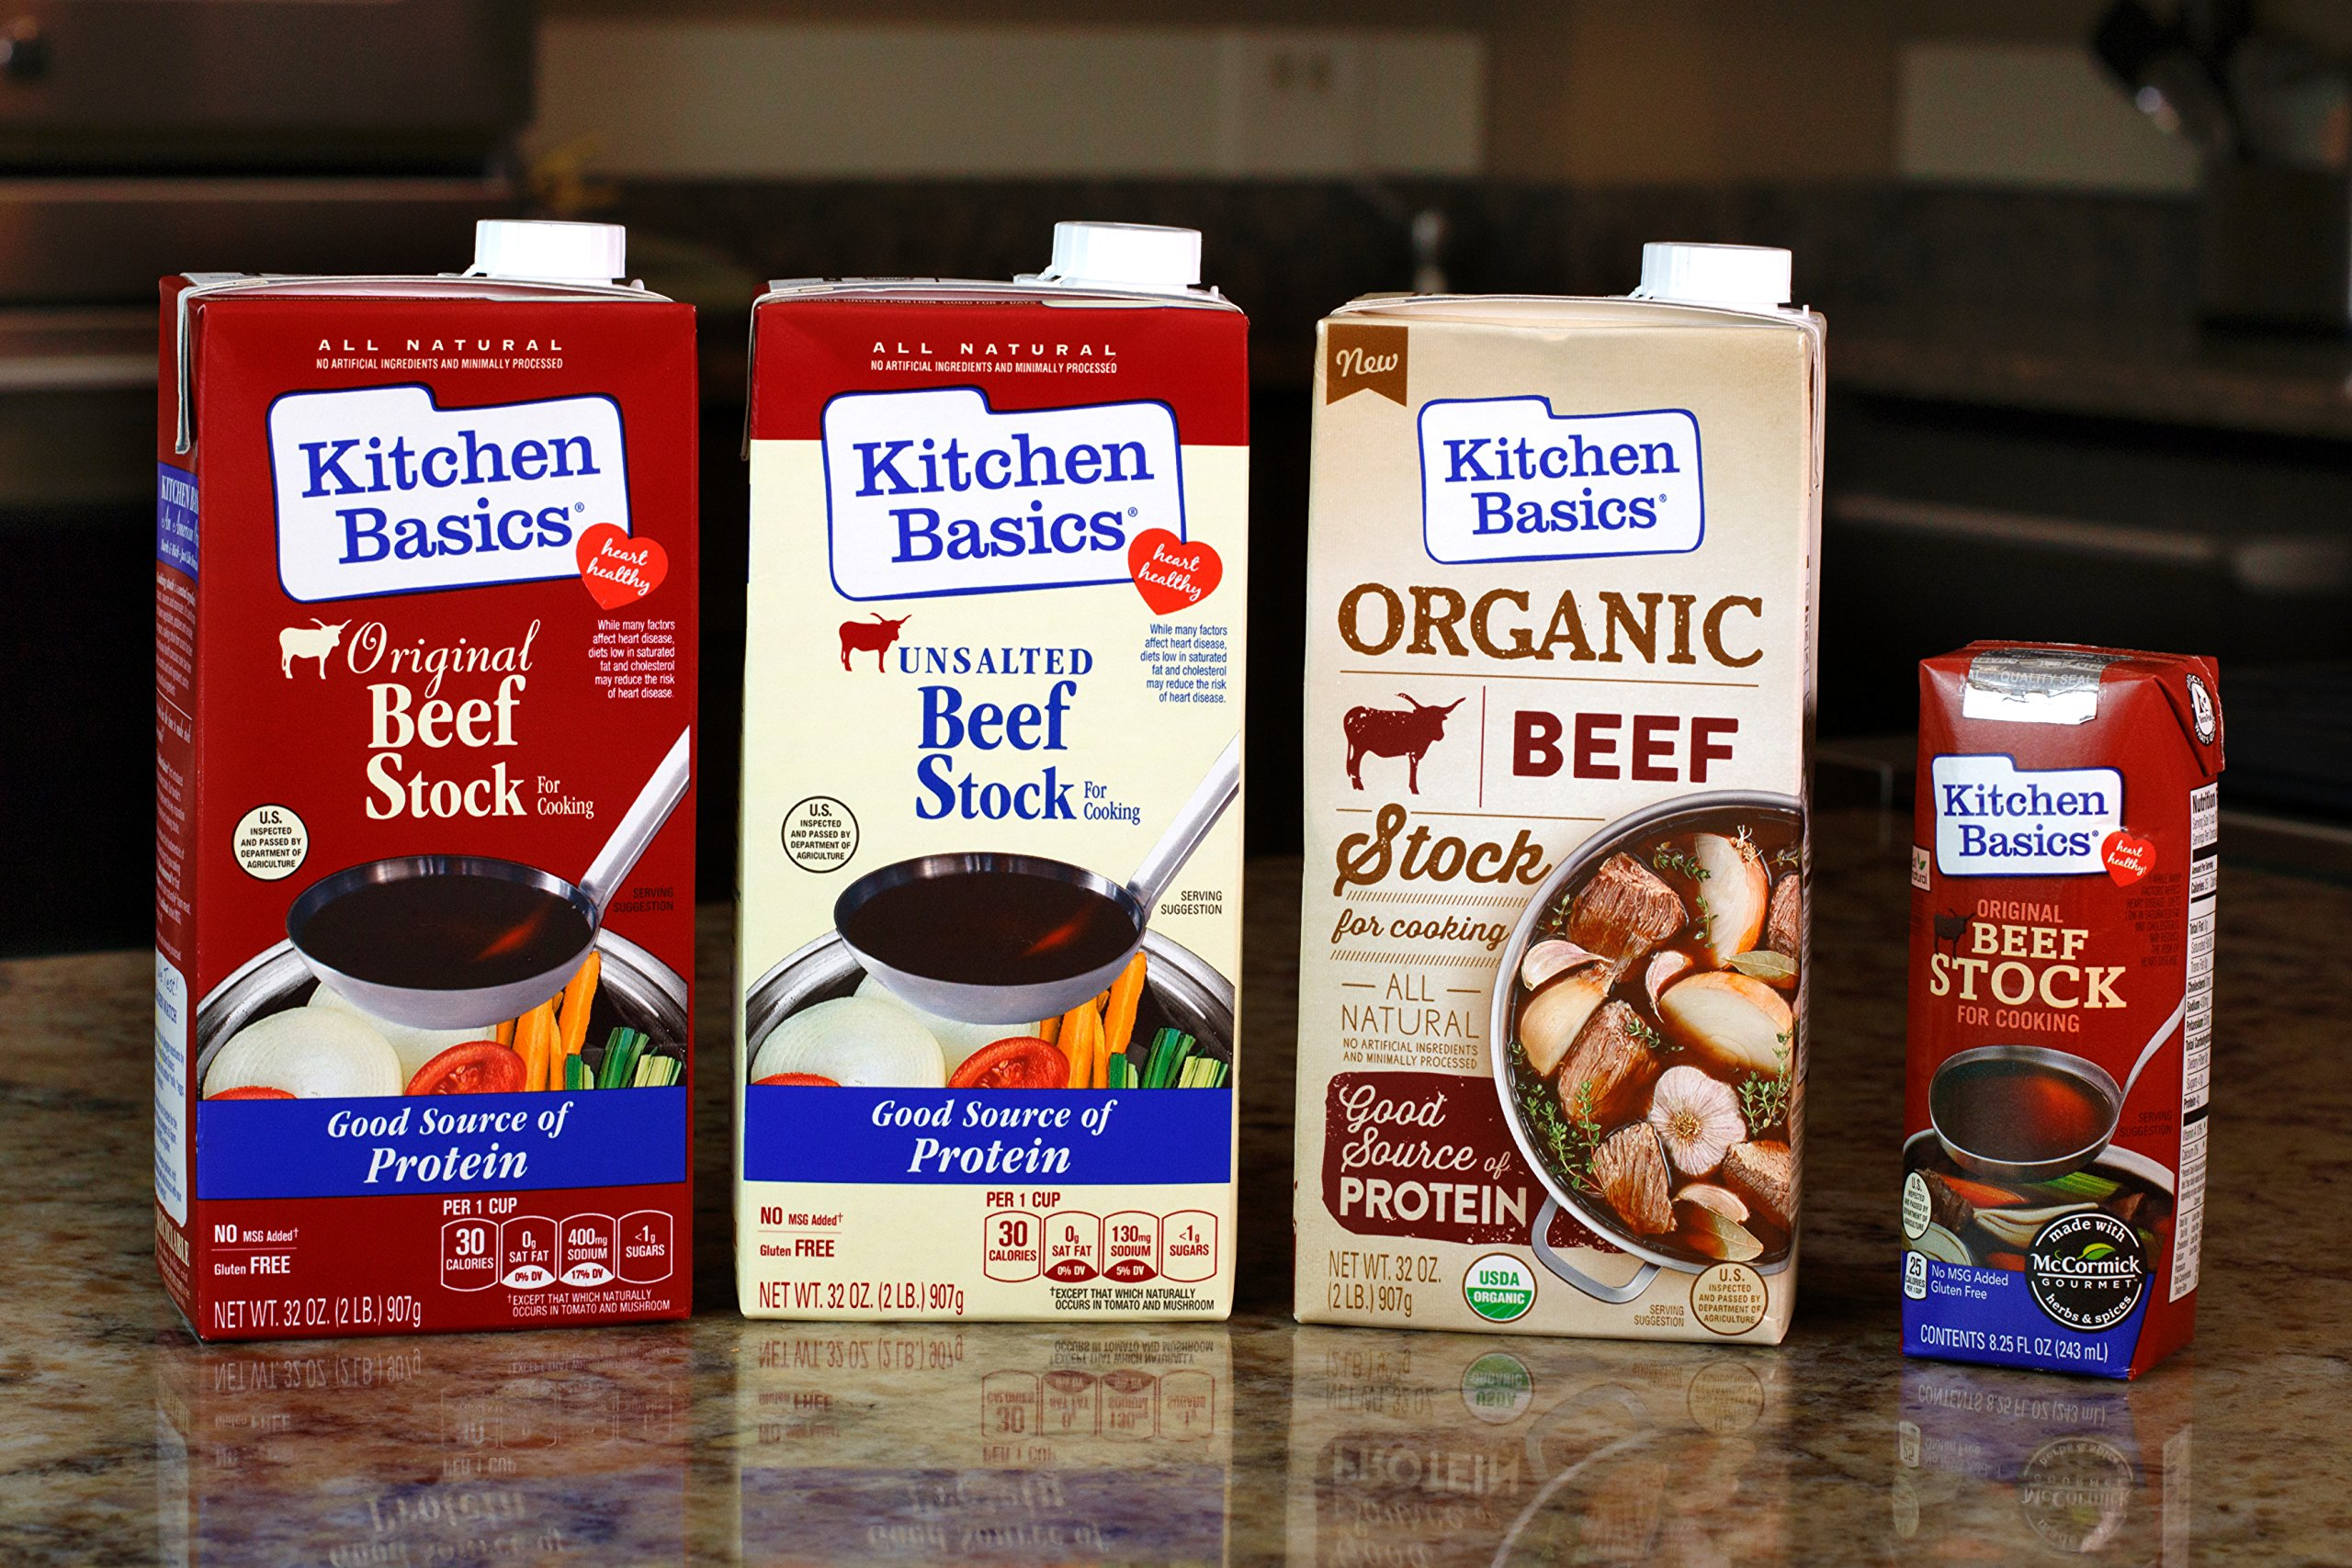 Kitchen Basics All Natural Unsalted Beef Stock, 32 fl oz by Kitchen Basics (Image #11)